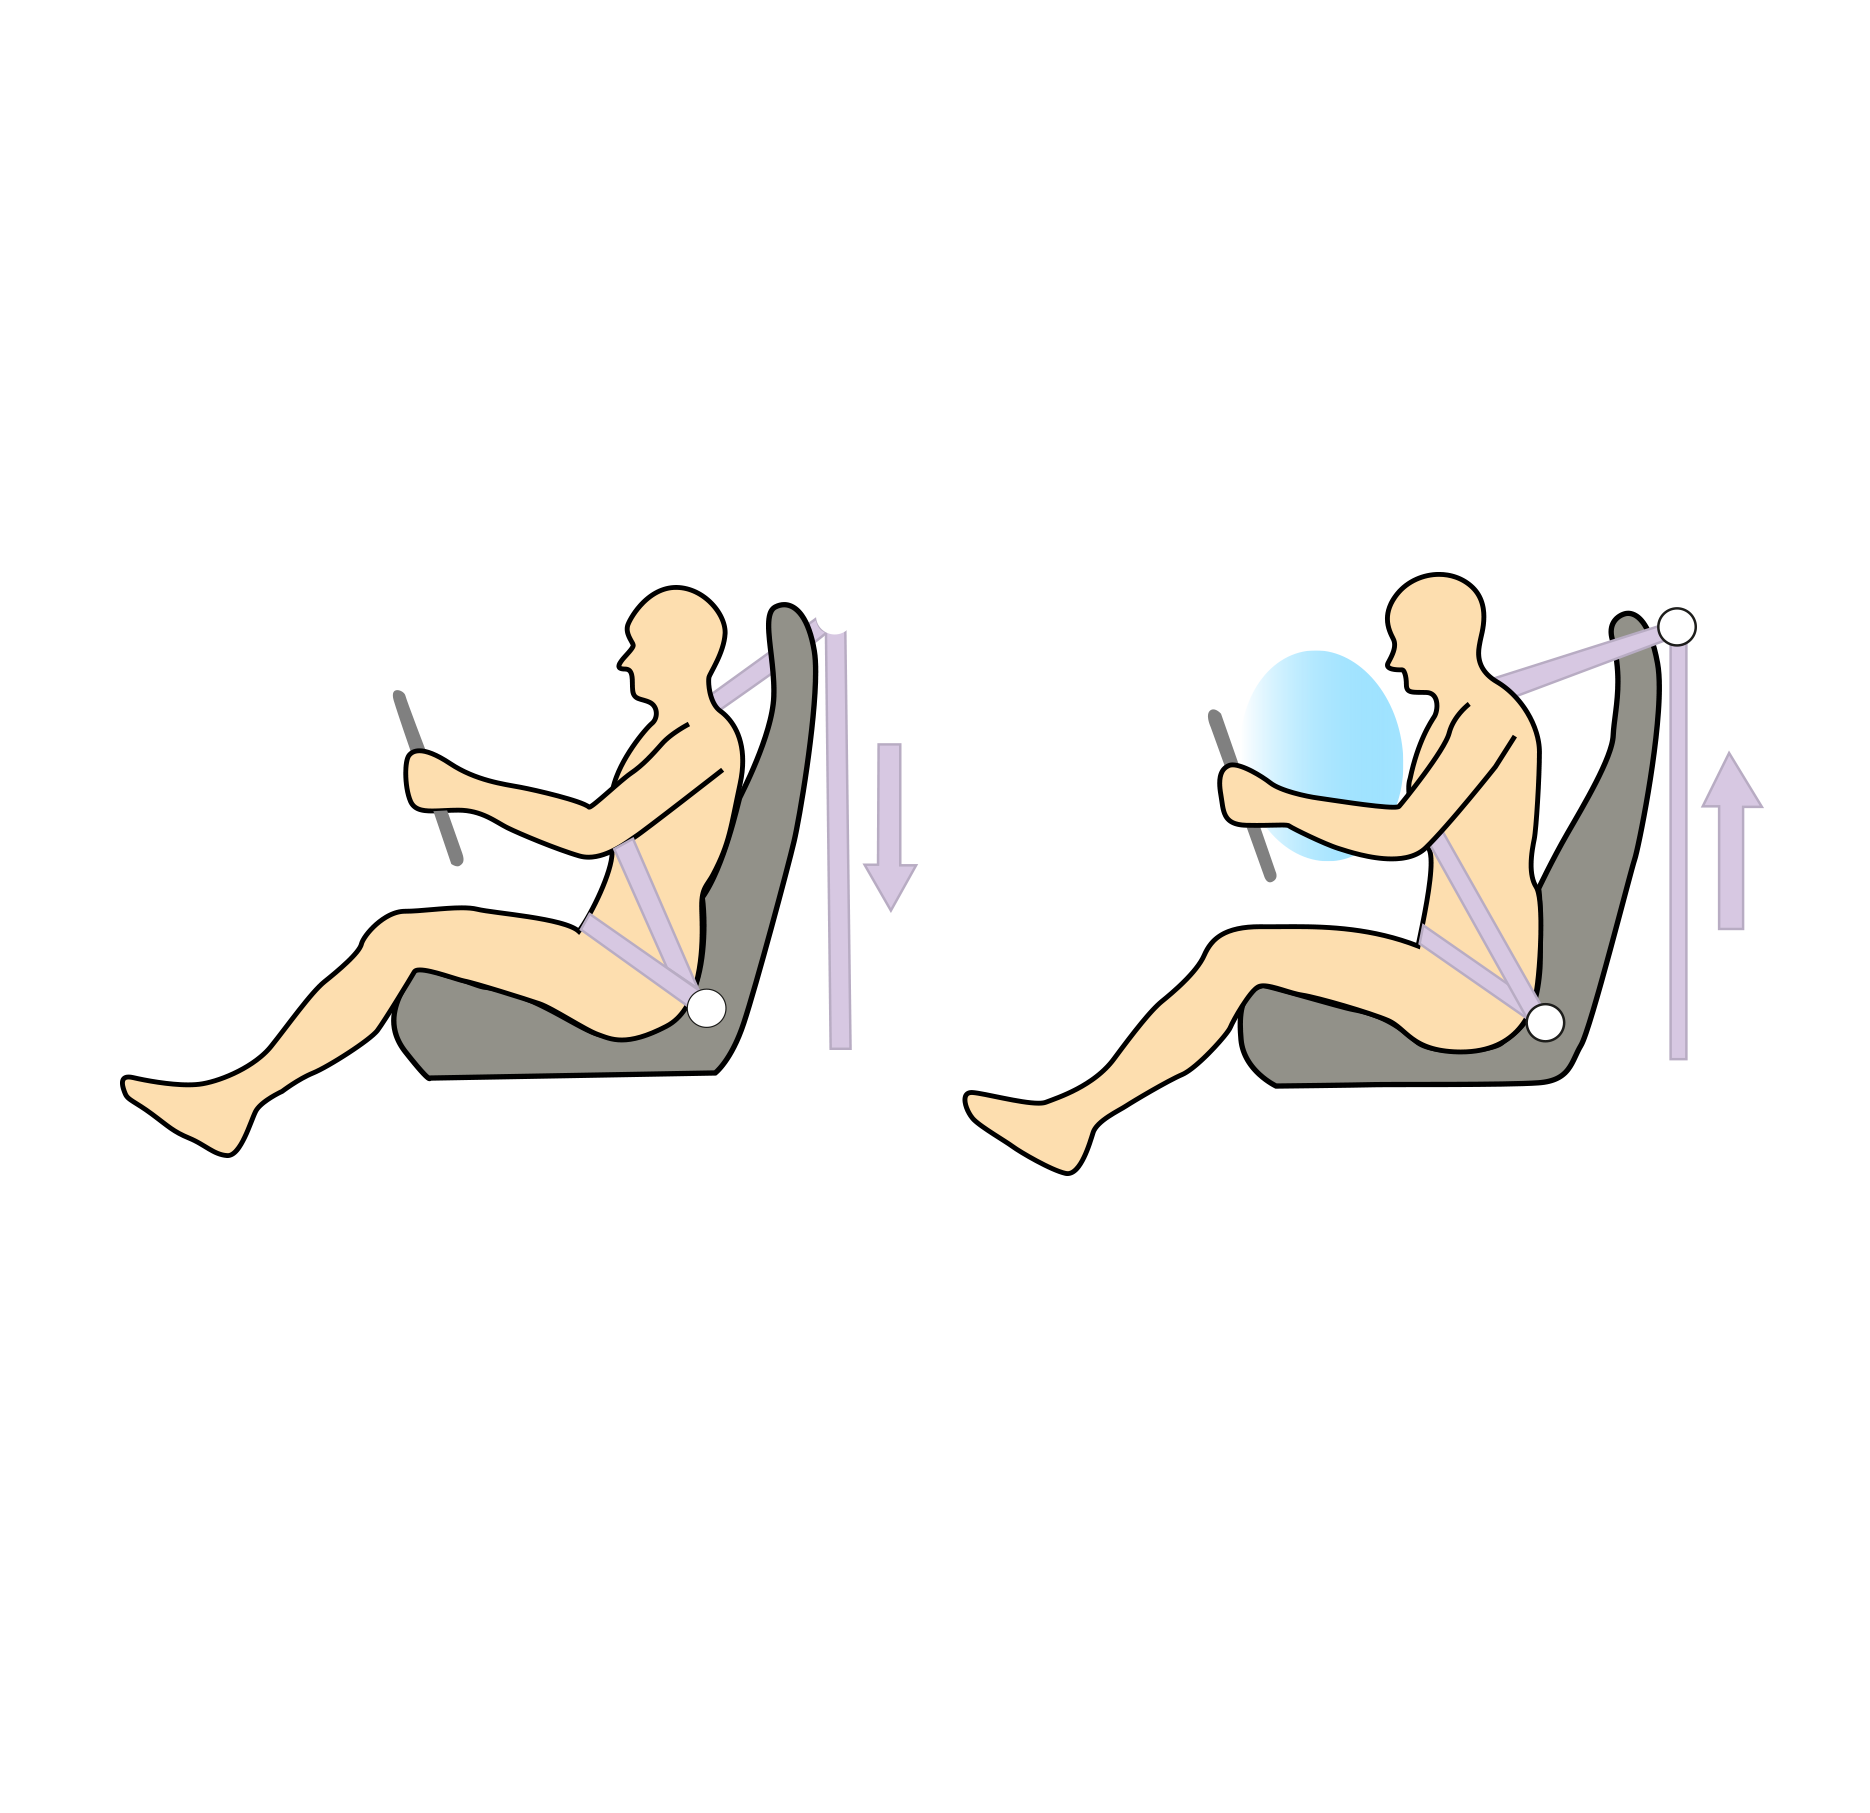 Pretensioner-with-Load-Limiter-Seatbelt